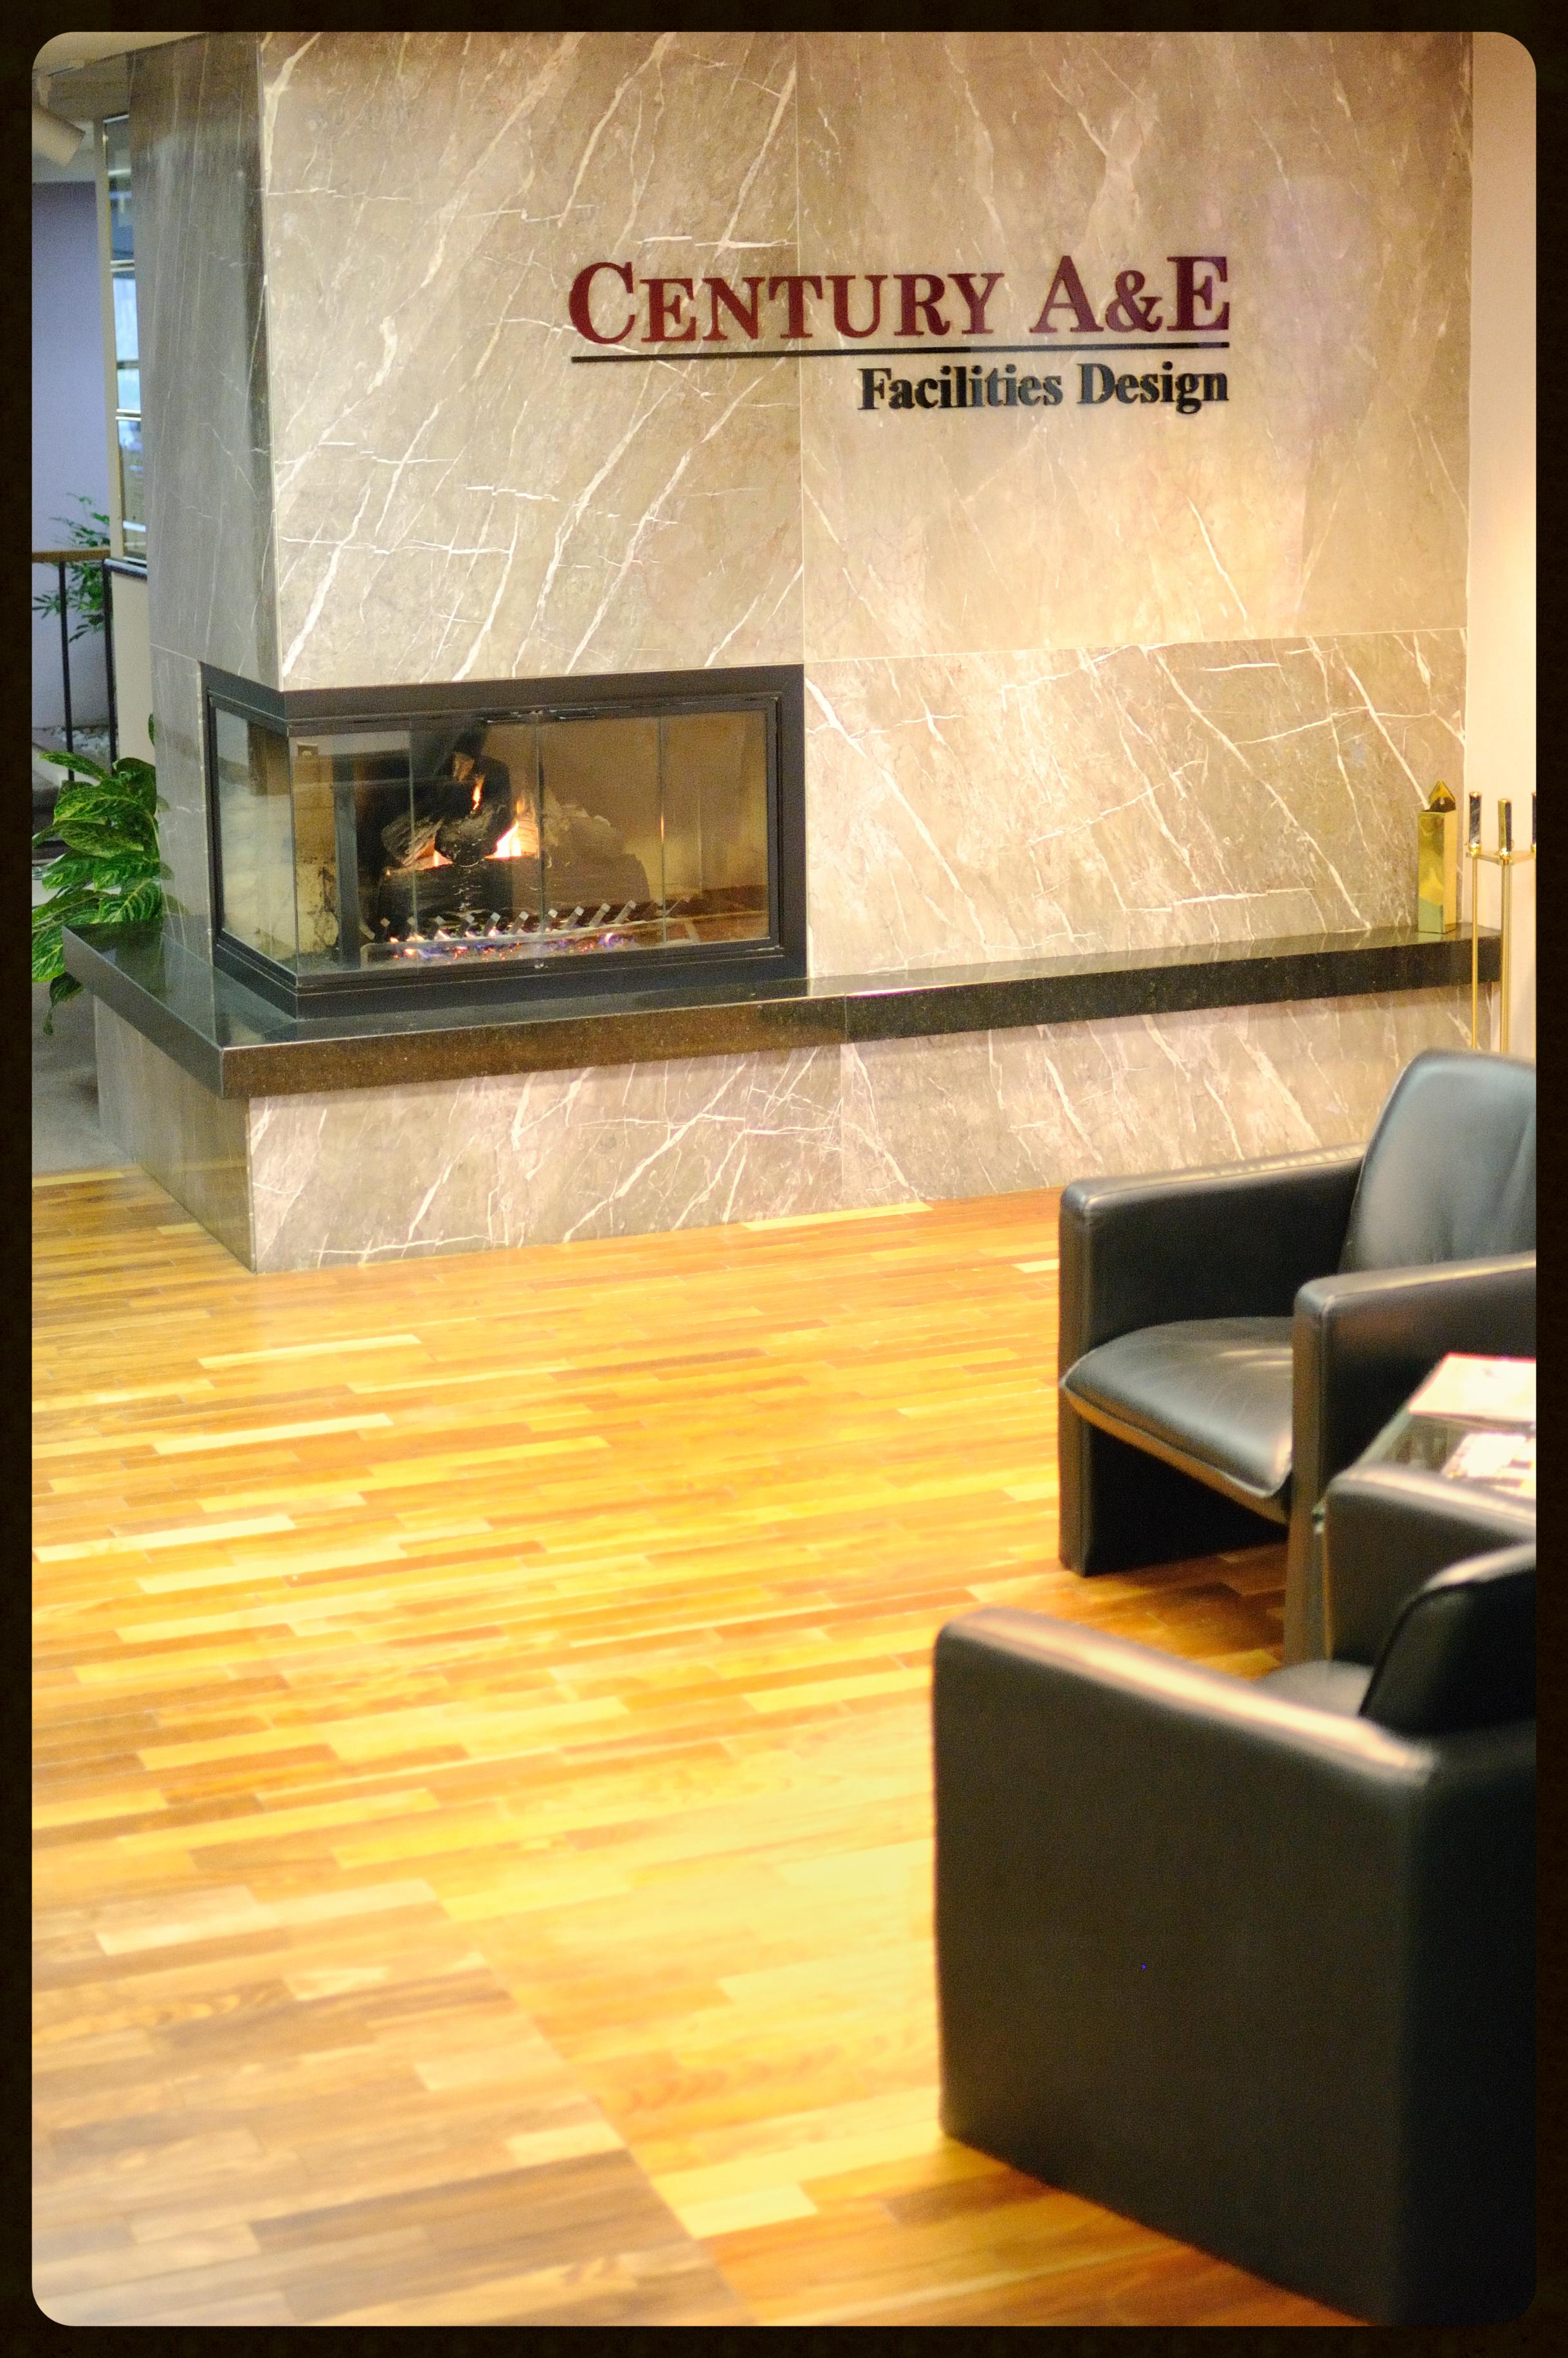 The Century A&E lobby